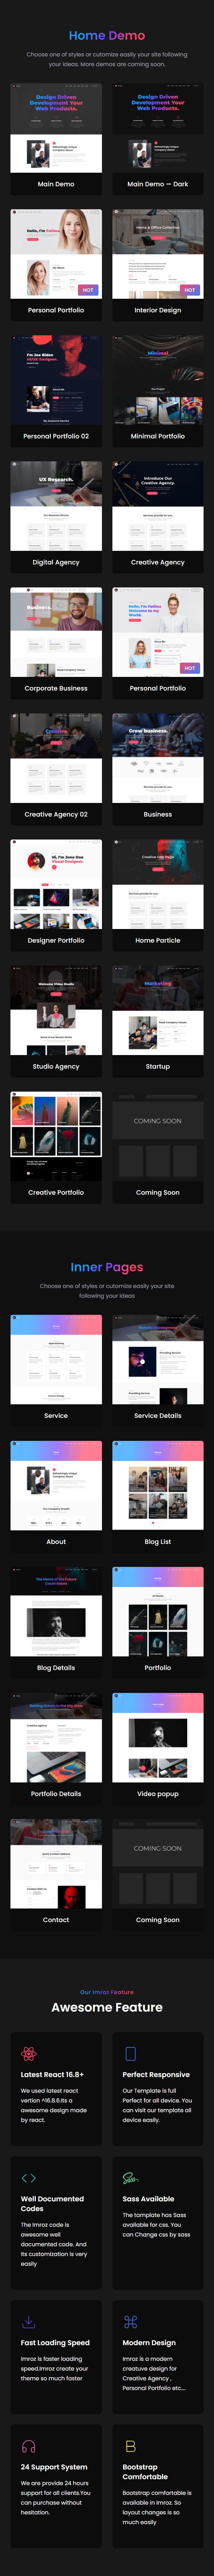 Imroz - React Agency & Portfolio Template - 7